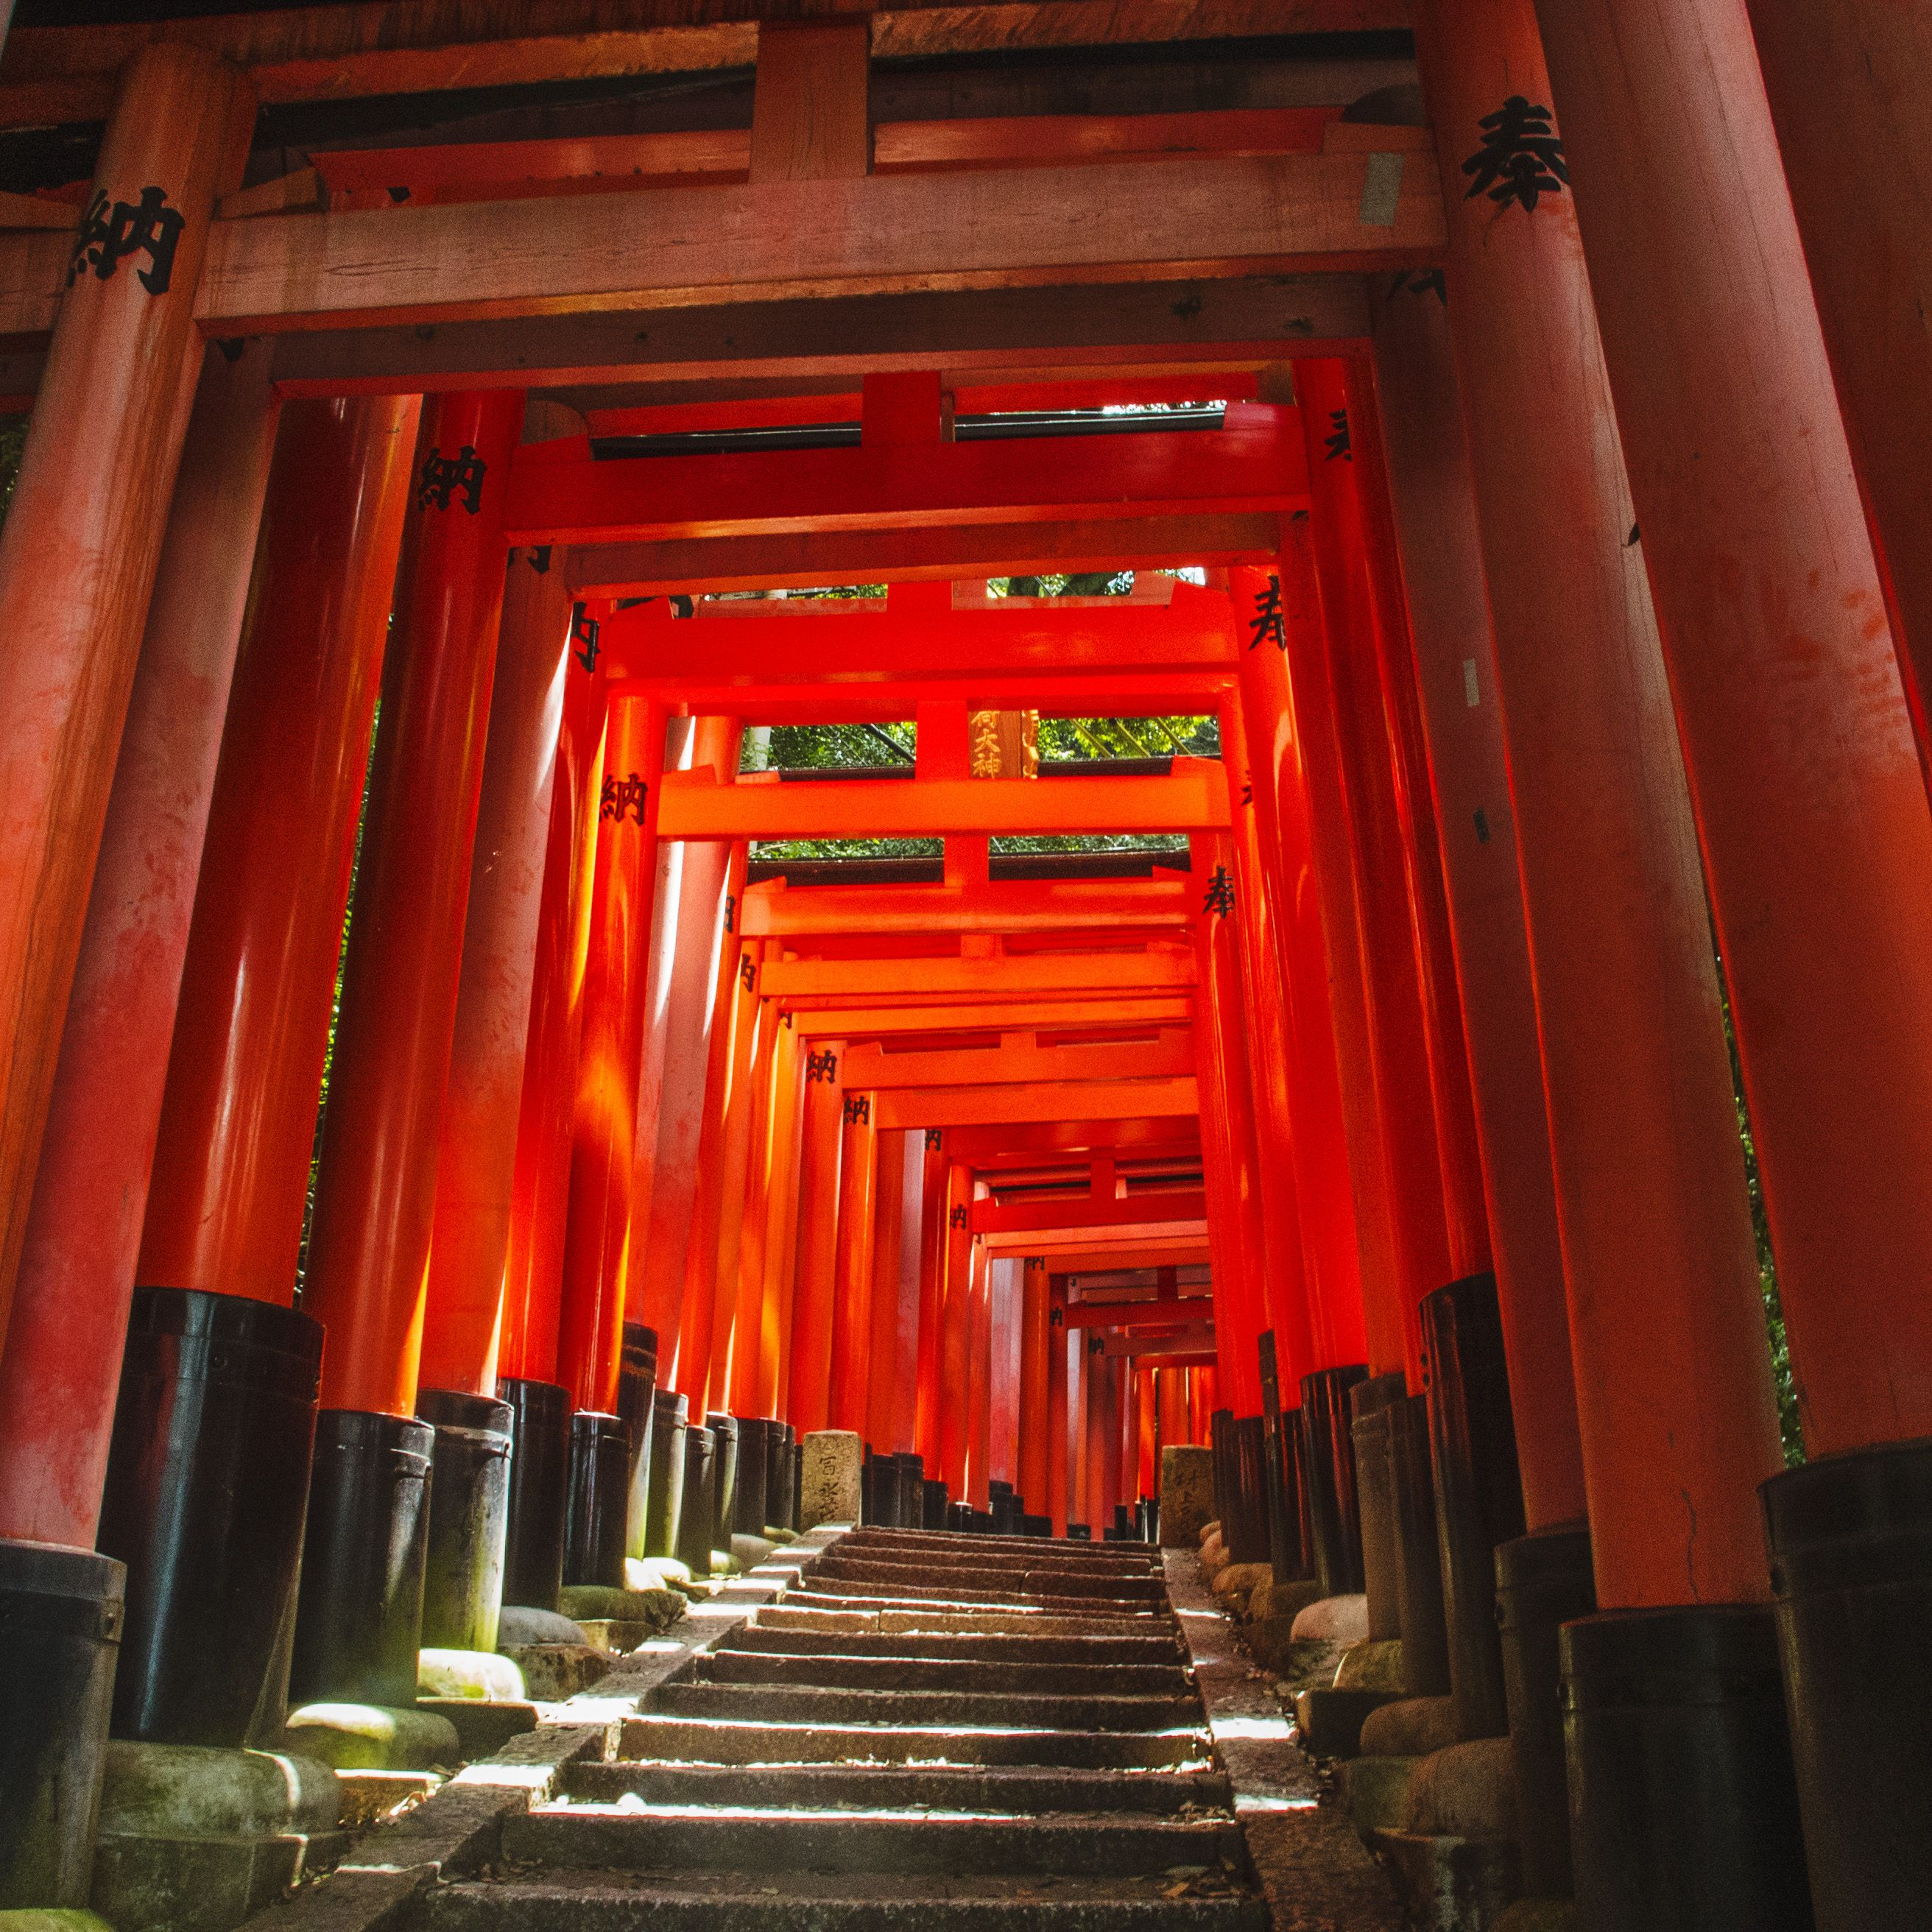 Japan's Fushimi Inari Shrine: The Complete Guide